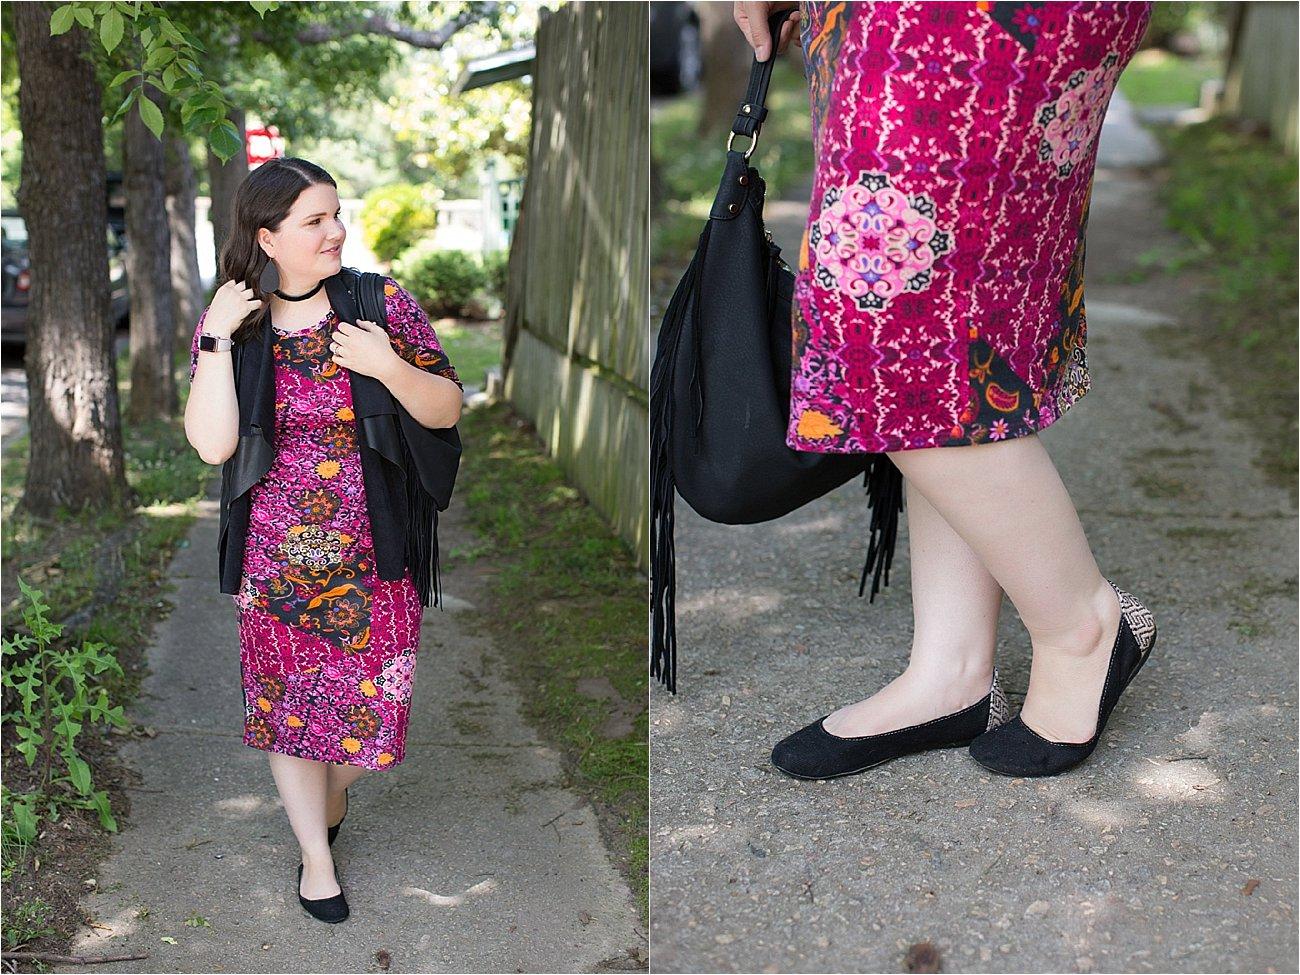 LulaRoe Julia Dress, Stitch Fix Kut From the Kloth Leather Vest, Nickel & Suede Earrings, Nickel & Suede Choker   North Carolina Fashion & Style Blogger (4)